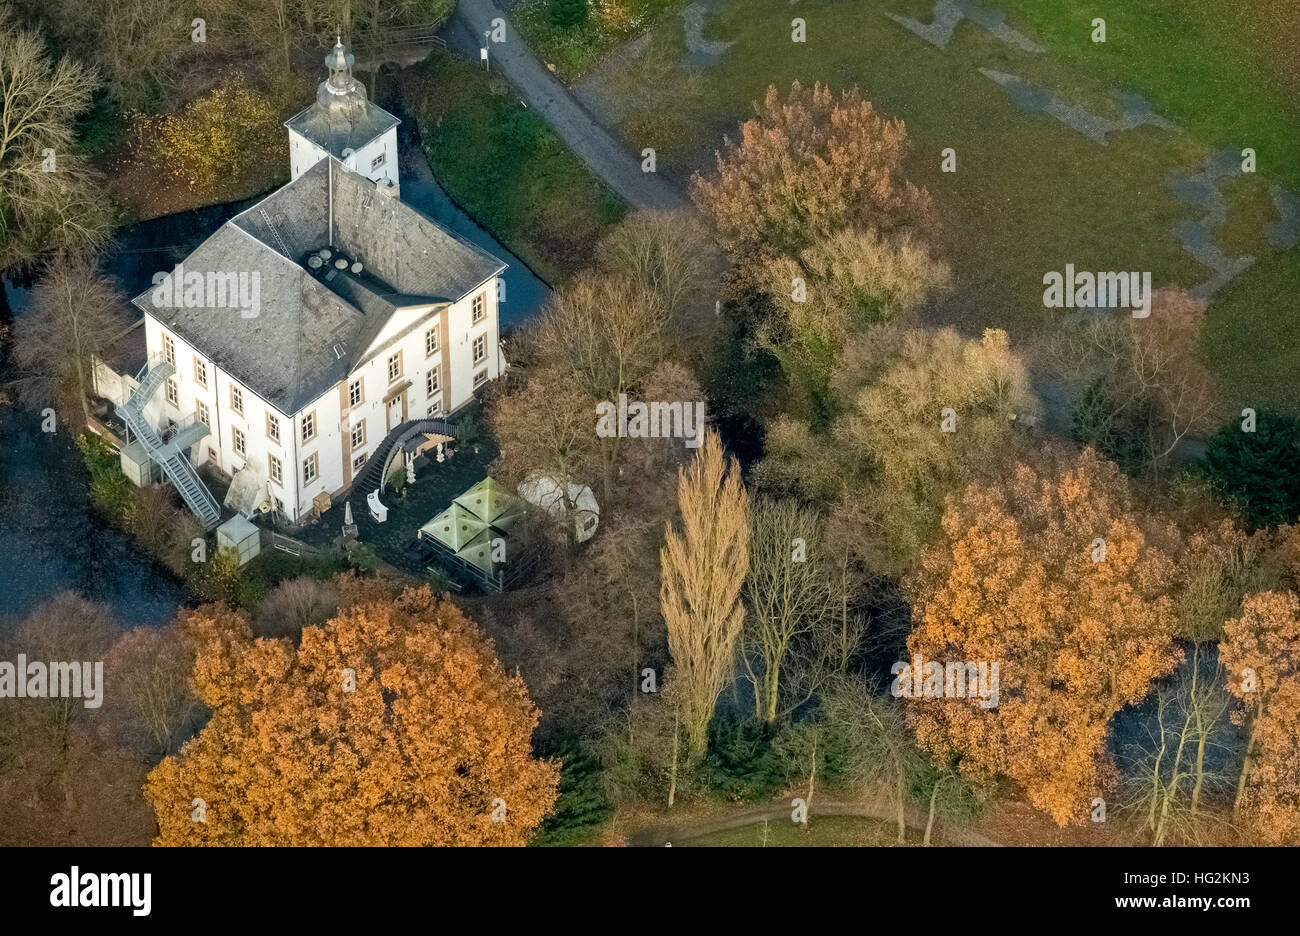 Aerial view,  water castle Wasserschloss Haus Voerde Voerde, Ruhr area, north rhine-westphalia, Ruhr aeria, - Stock Image